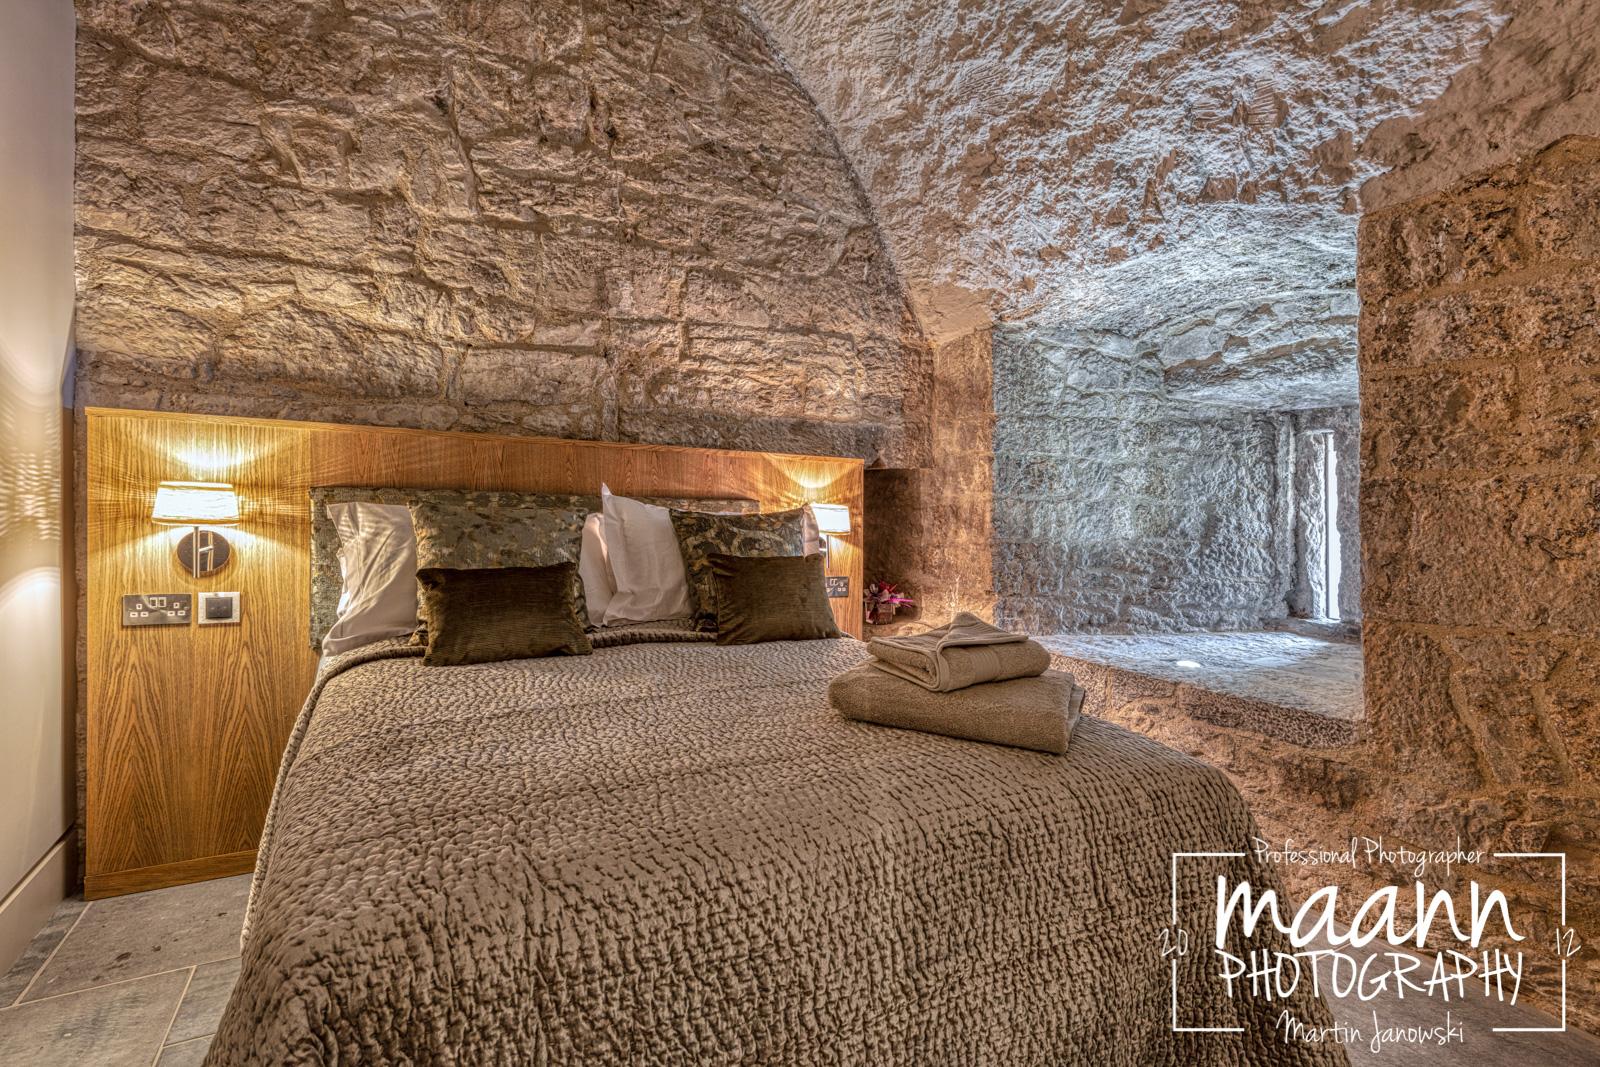 interior photography - Maann Photography